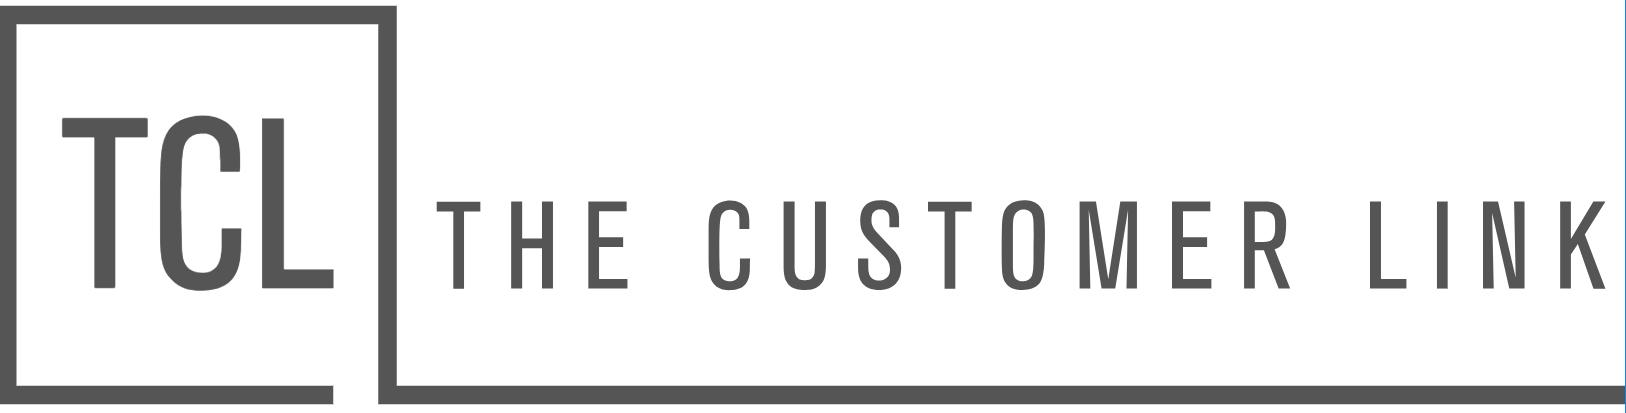 The Customer Link